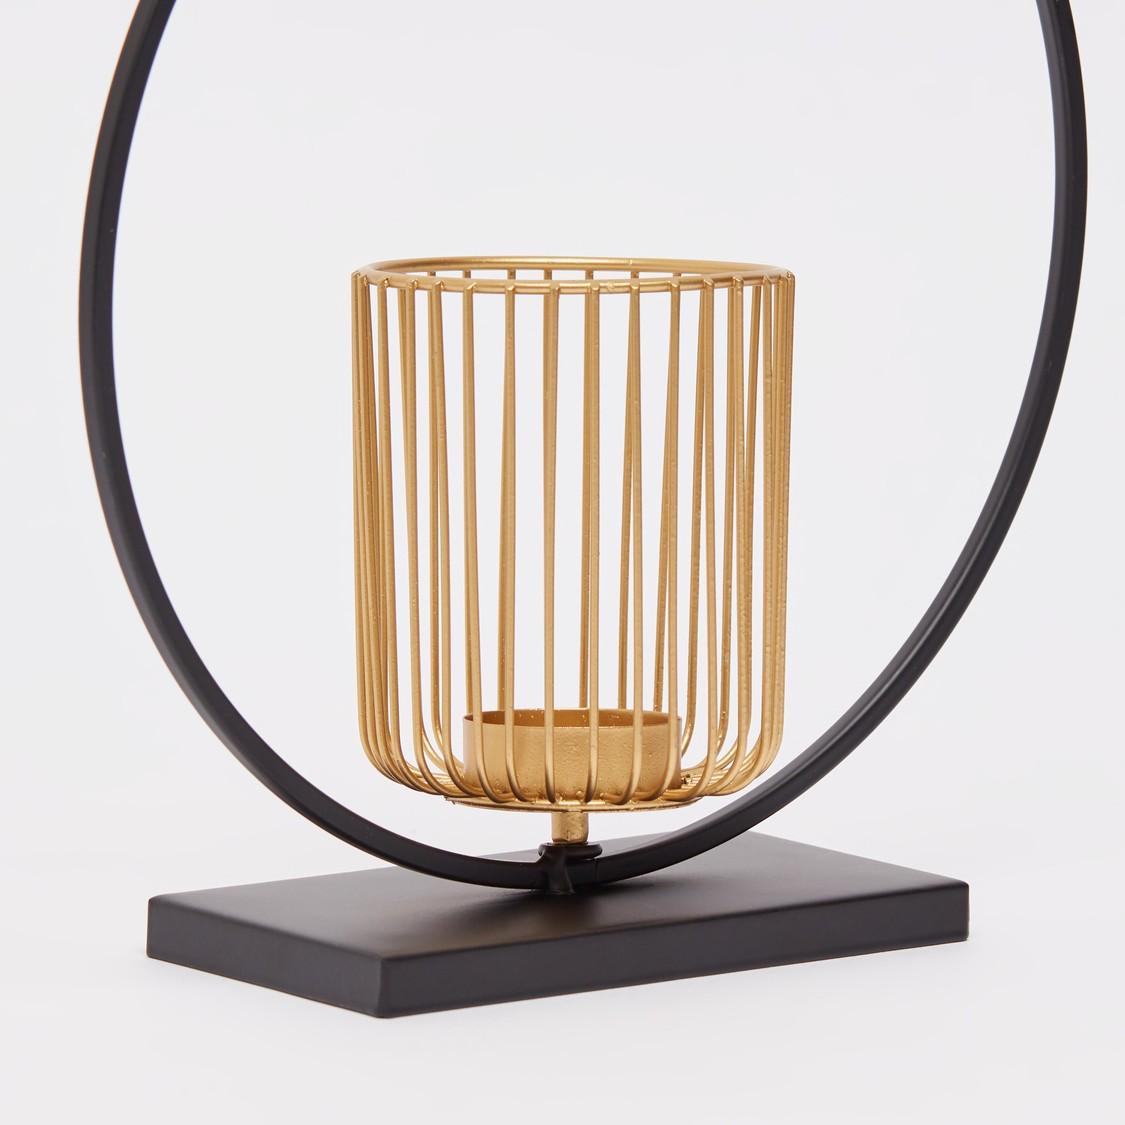 Decorative Candle Holder - 24x8x25 cms